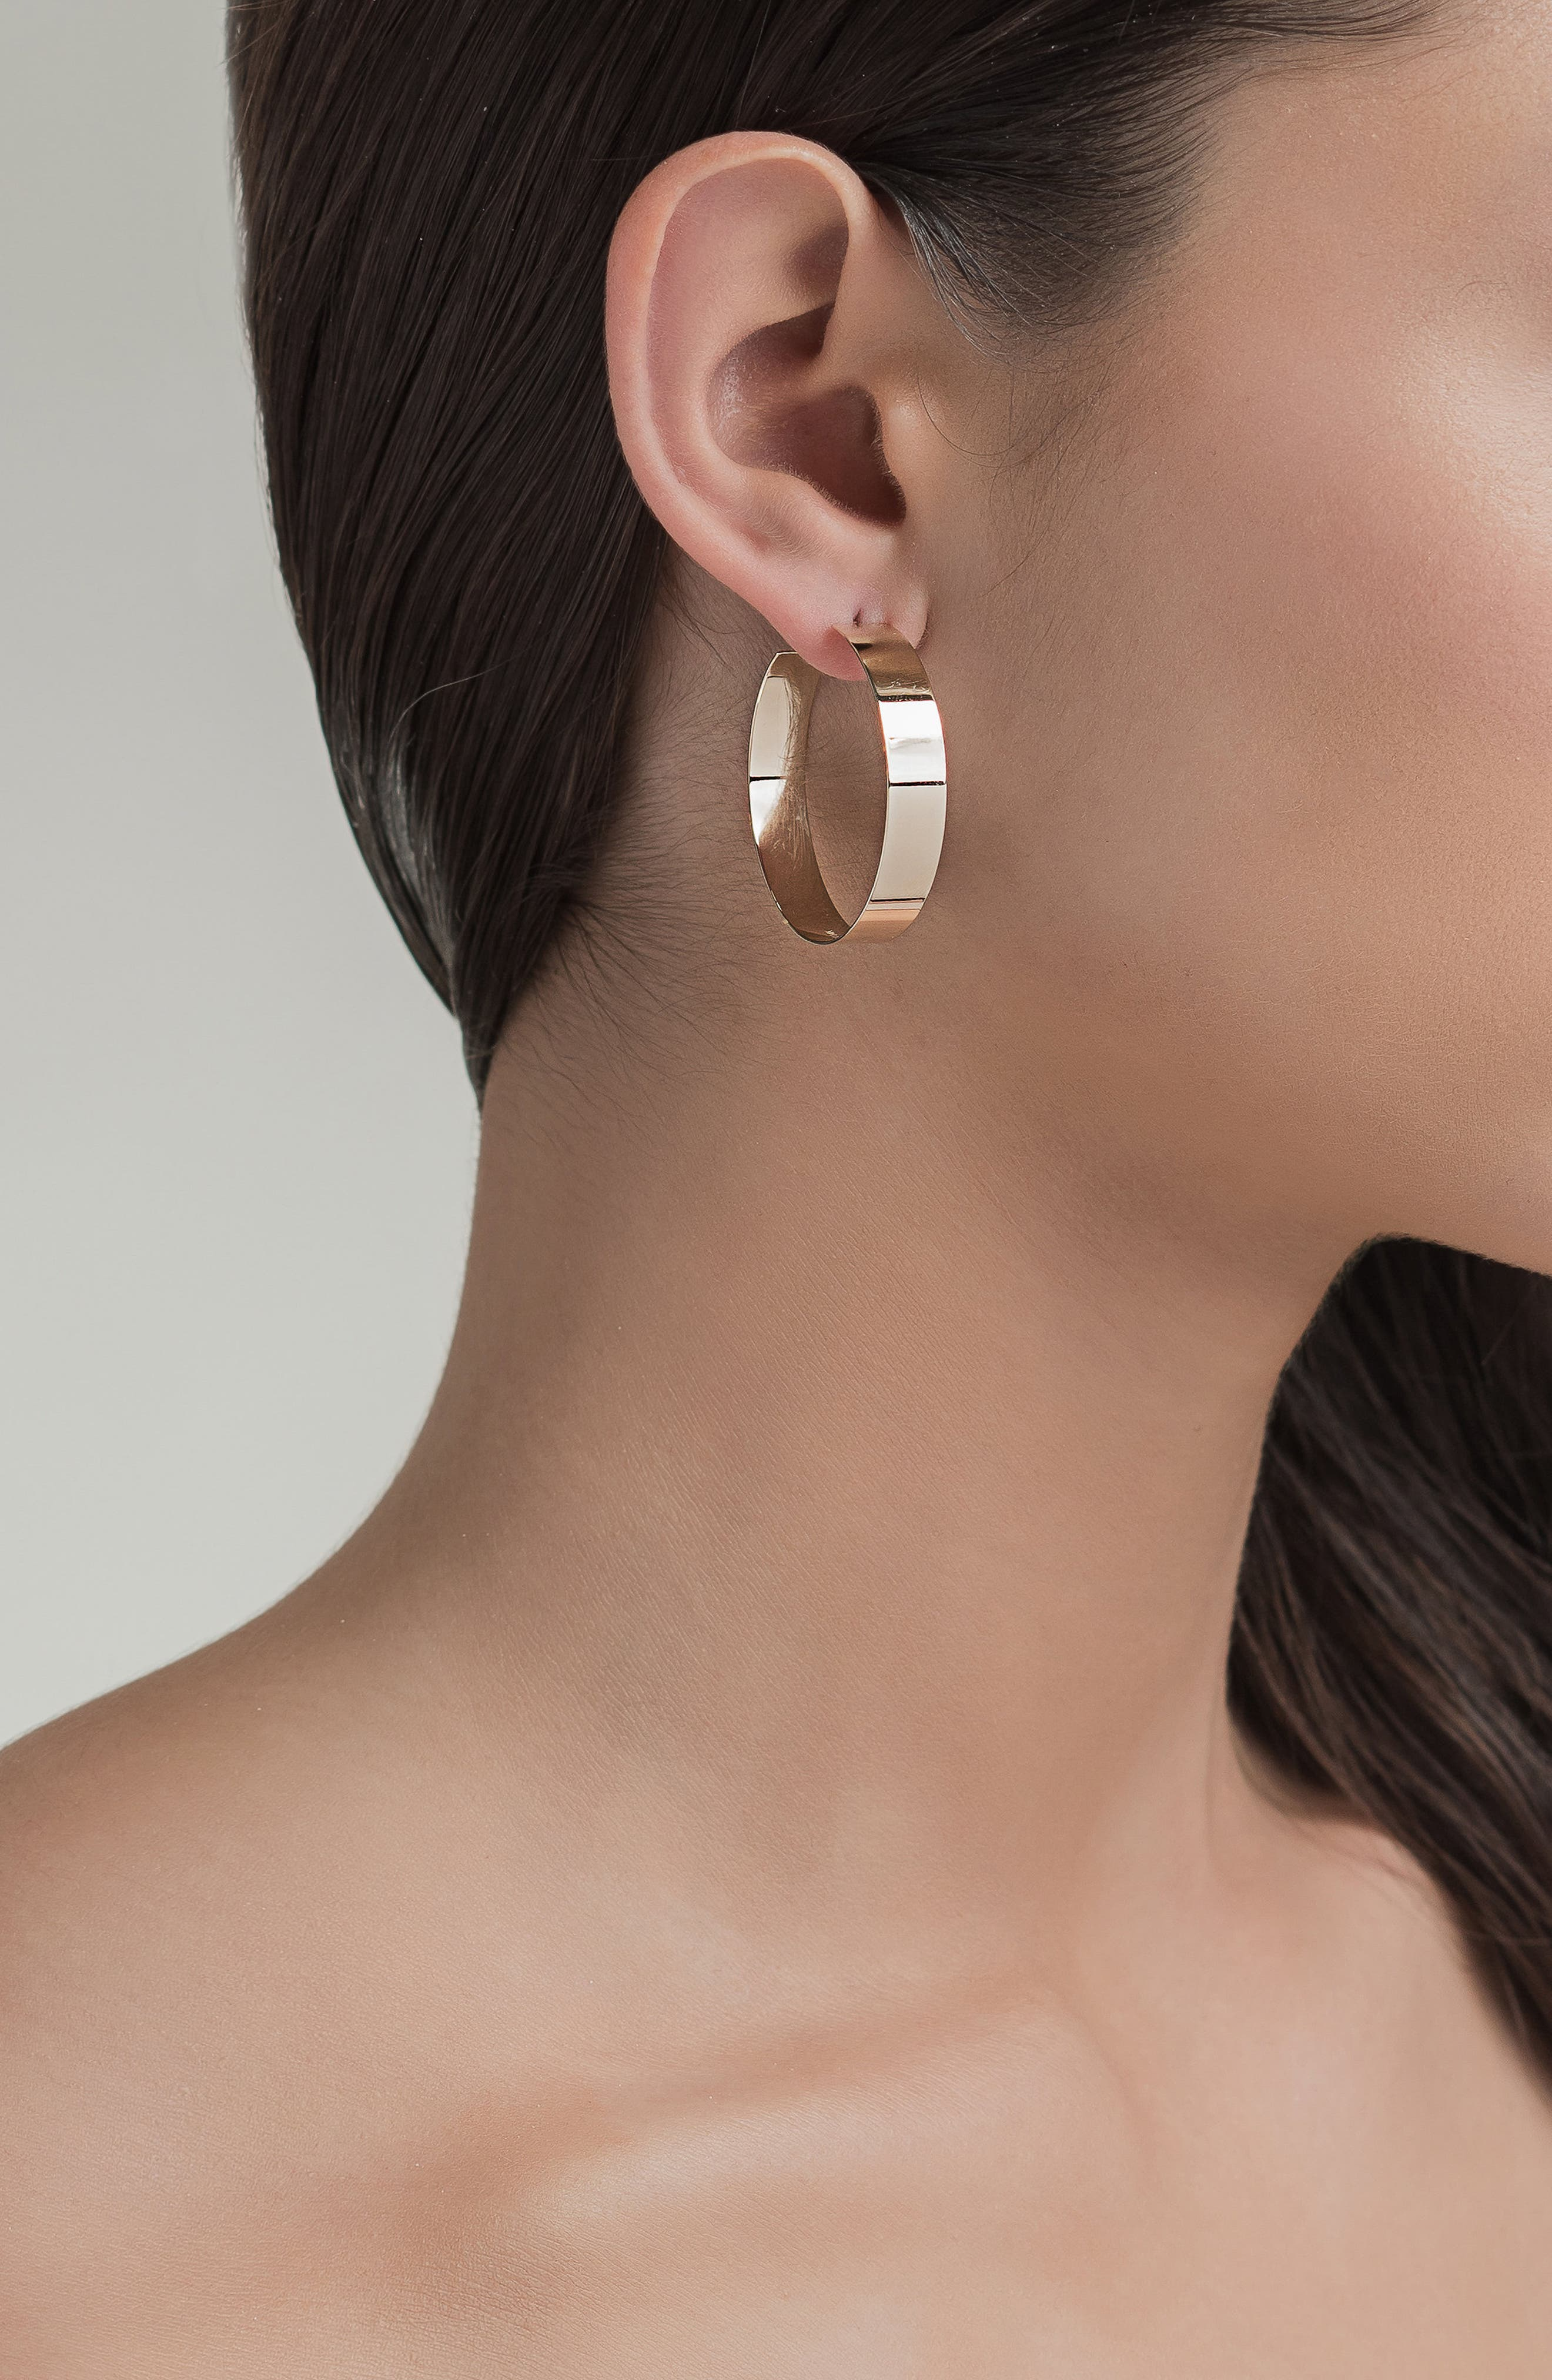 'Vanity' Small Hoop Earrings,                             Alternate thumbnail 2, color,                             YELLOW GOLD